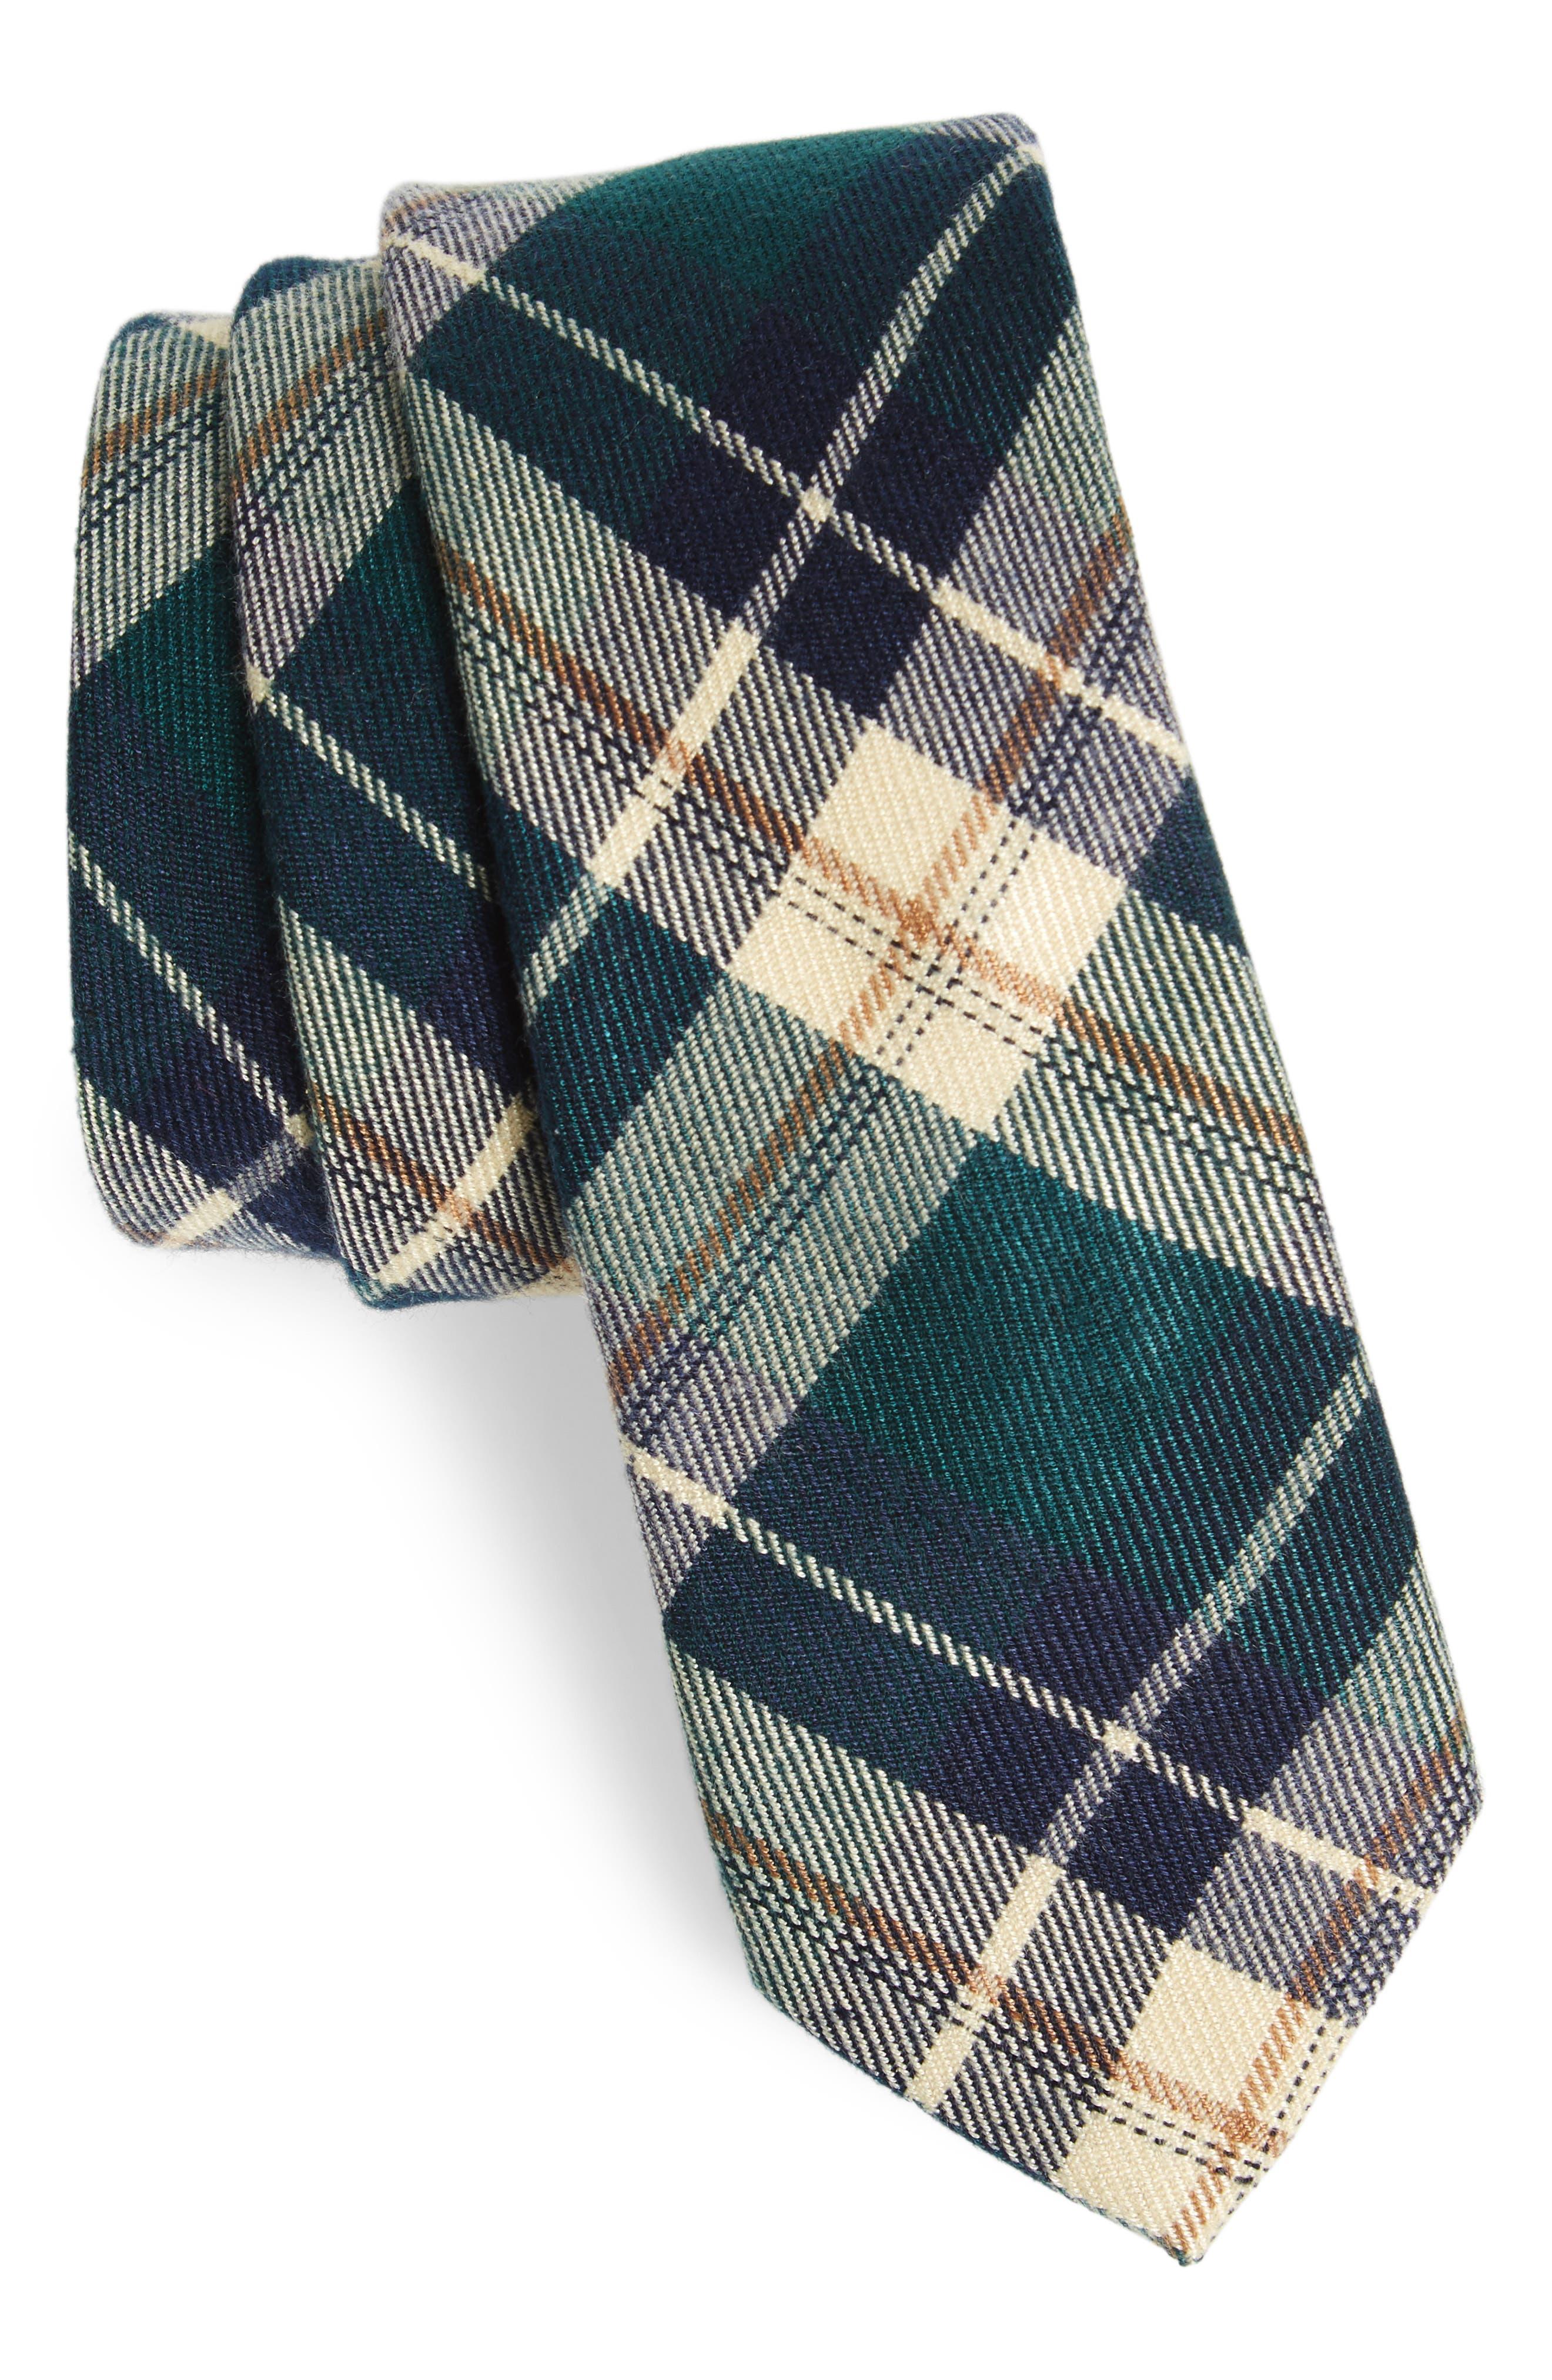 Howerton Plaid Cotton Skinny Tie,                         Main,                         color, Green